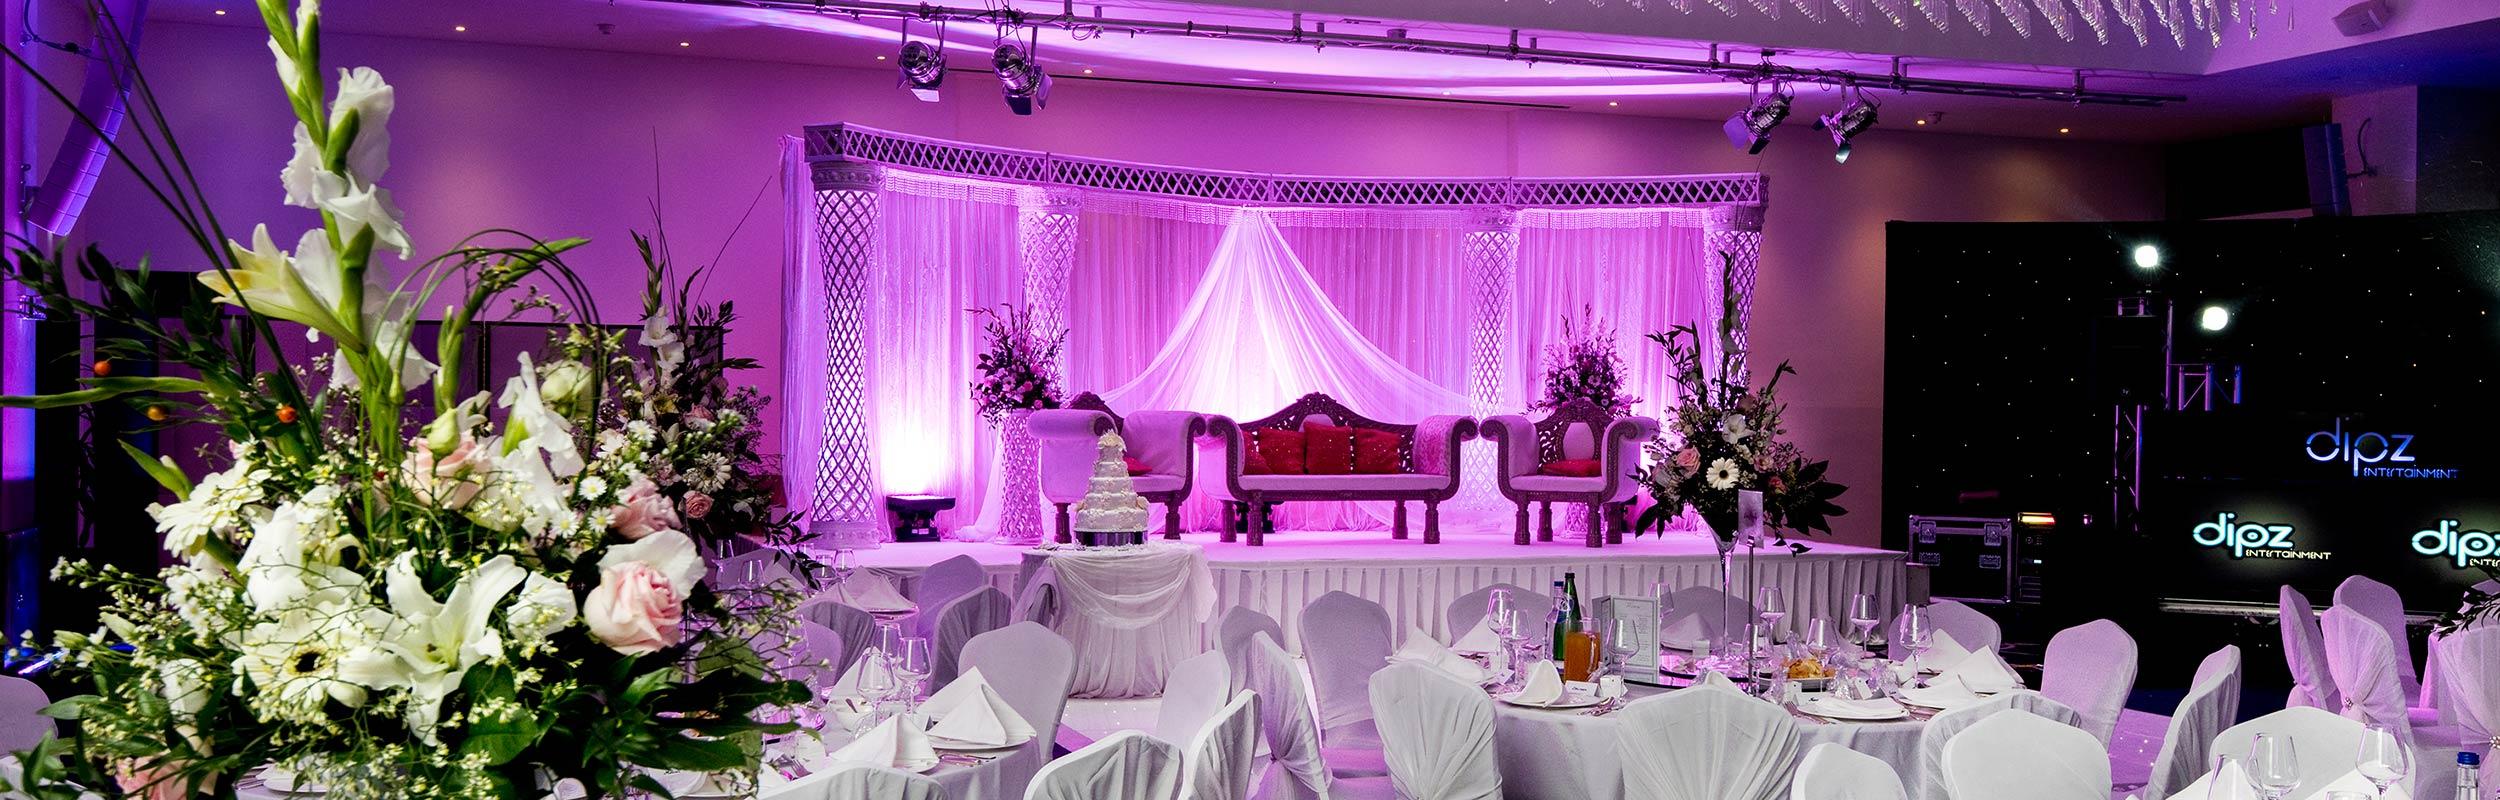 London wedding venues grand ballroom at the montcalm london for 27 devonshire terrace paddington london w2 3dp england